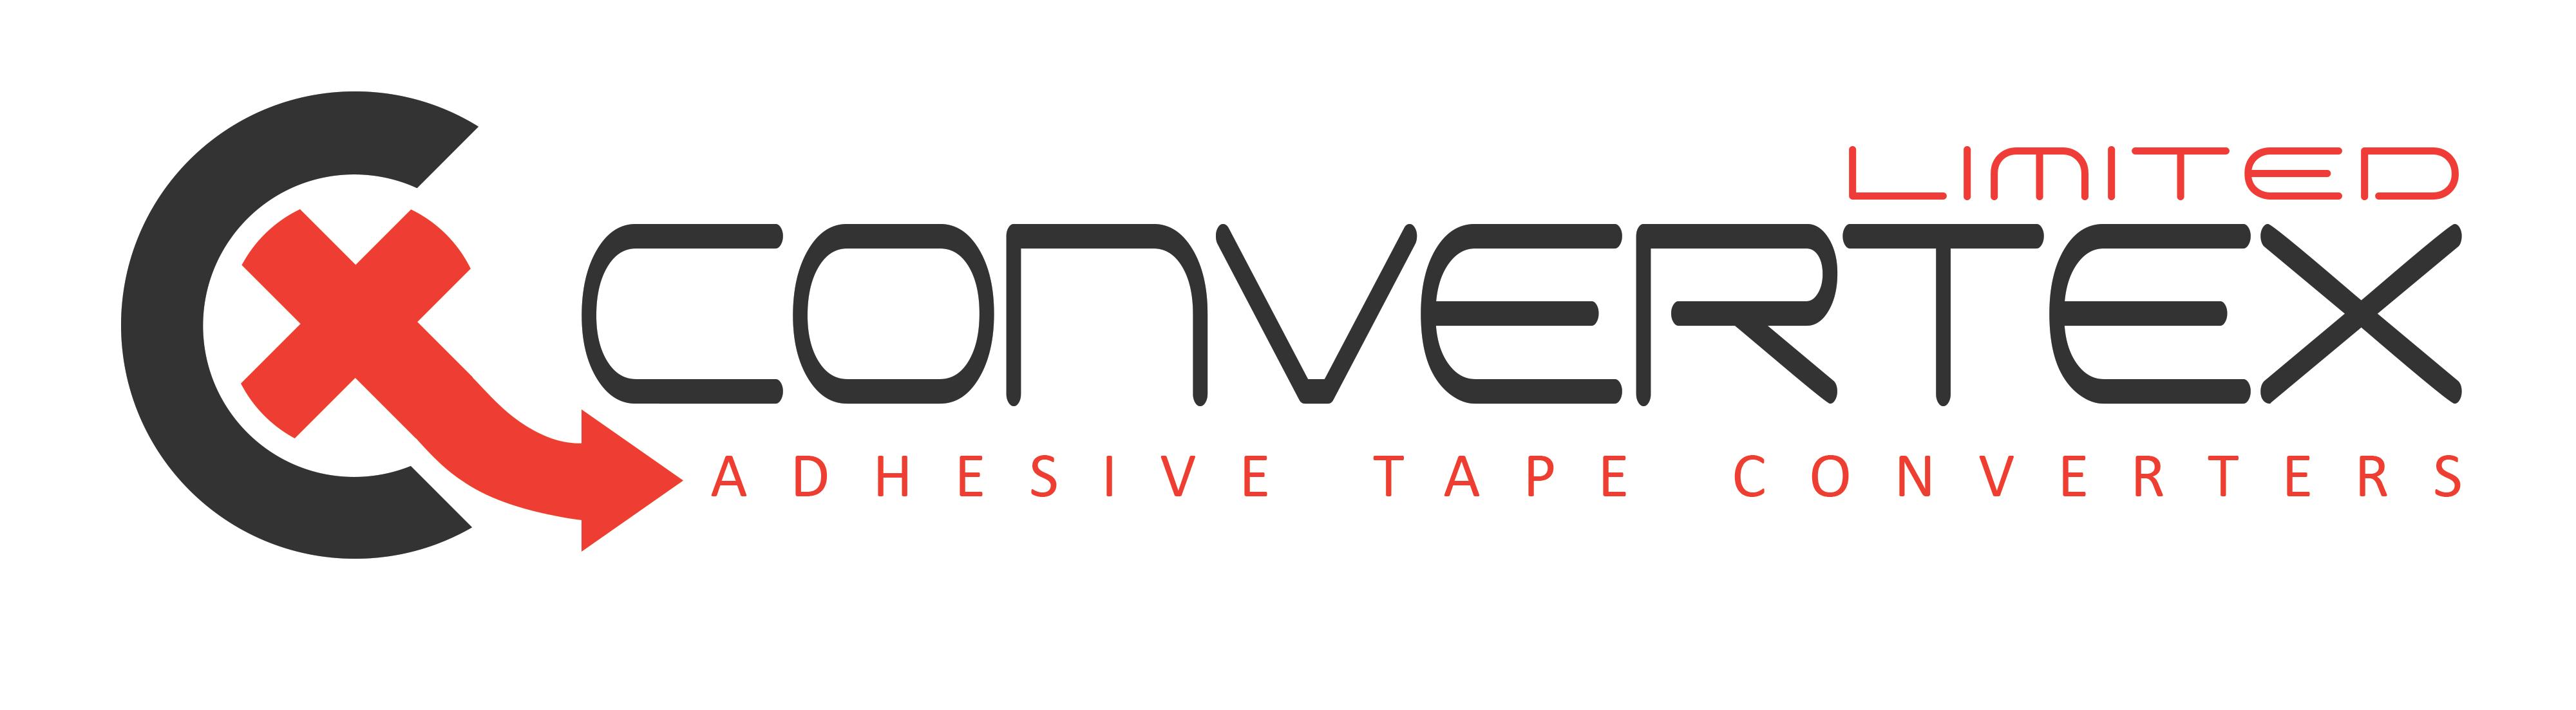 Convertex Adhesive Tape Logo